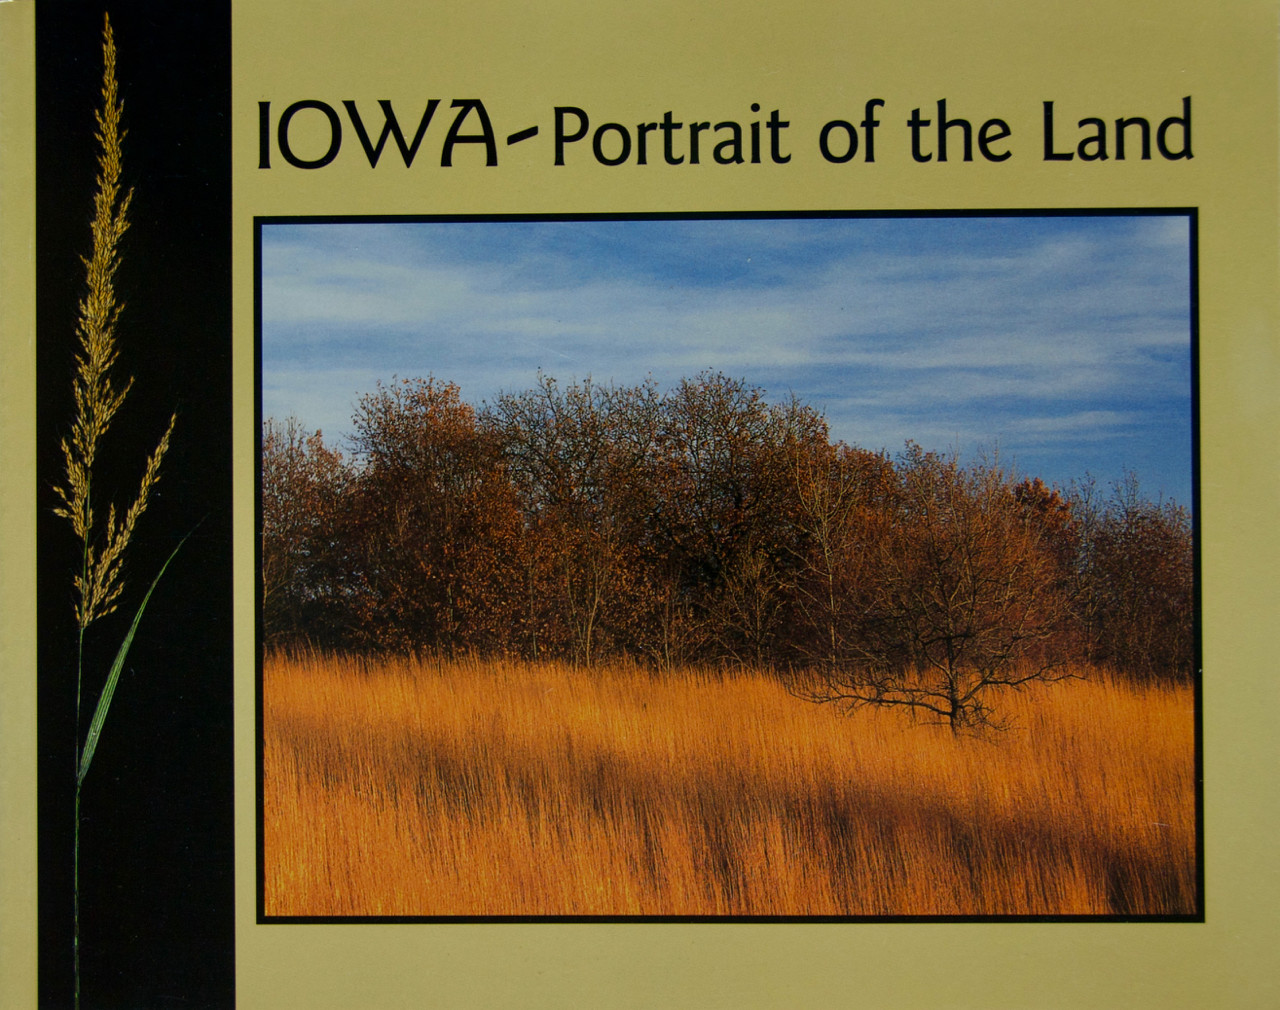 Iowa: Portrait of the Land